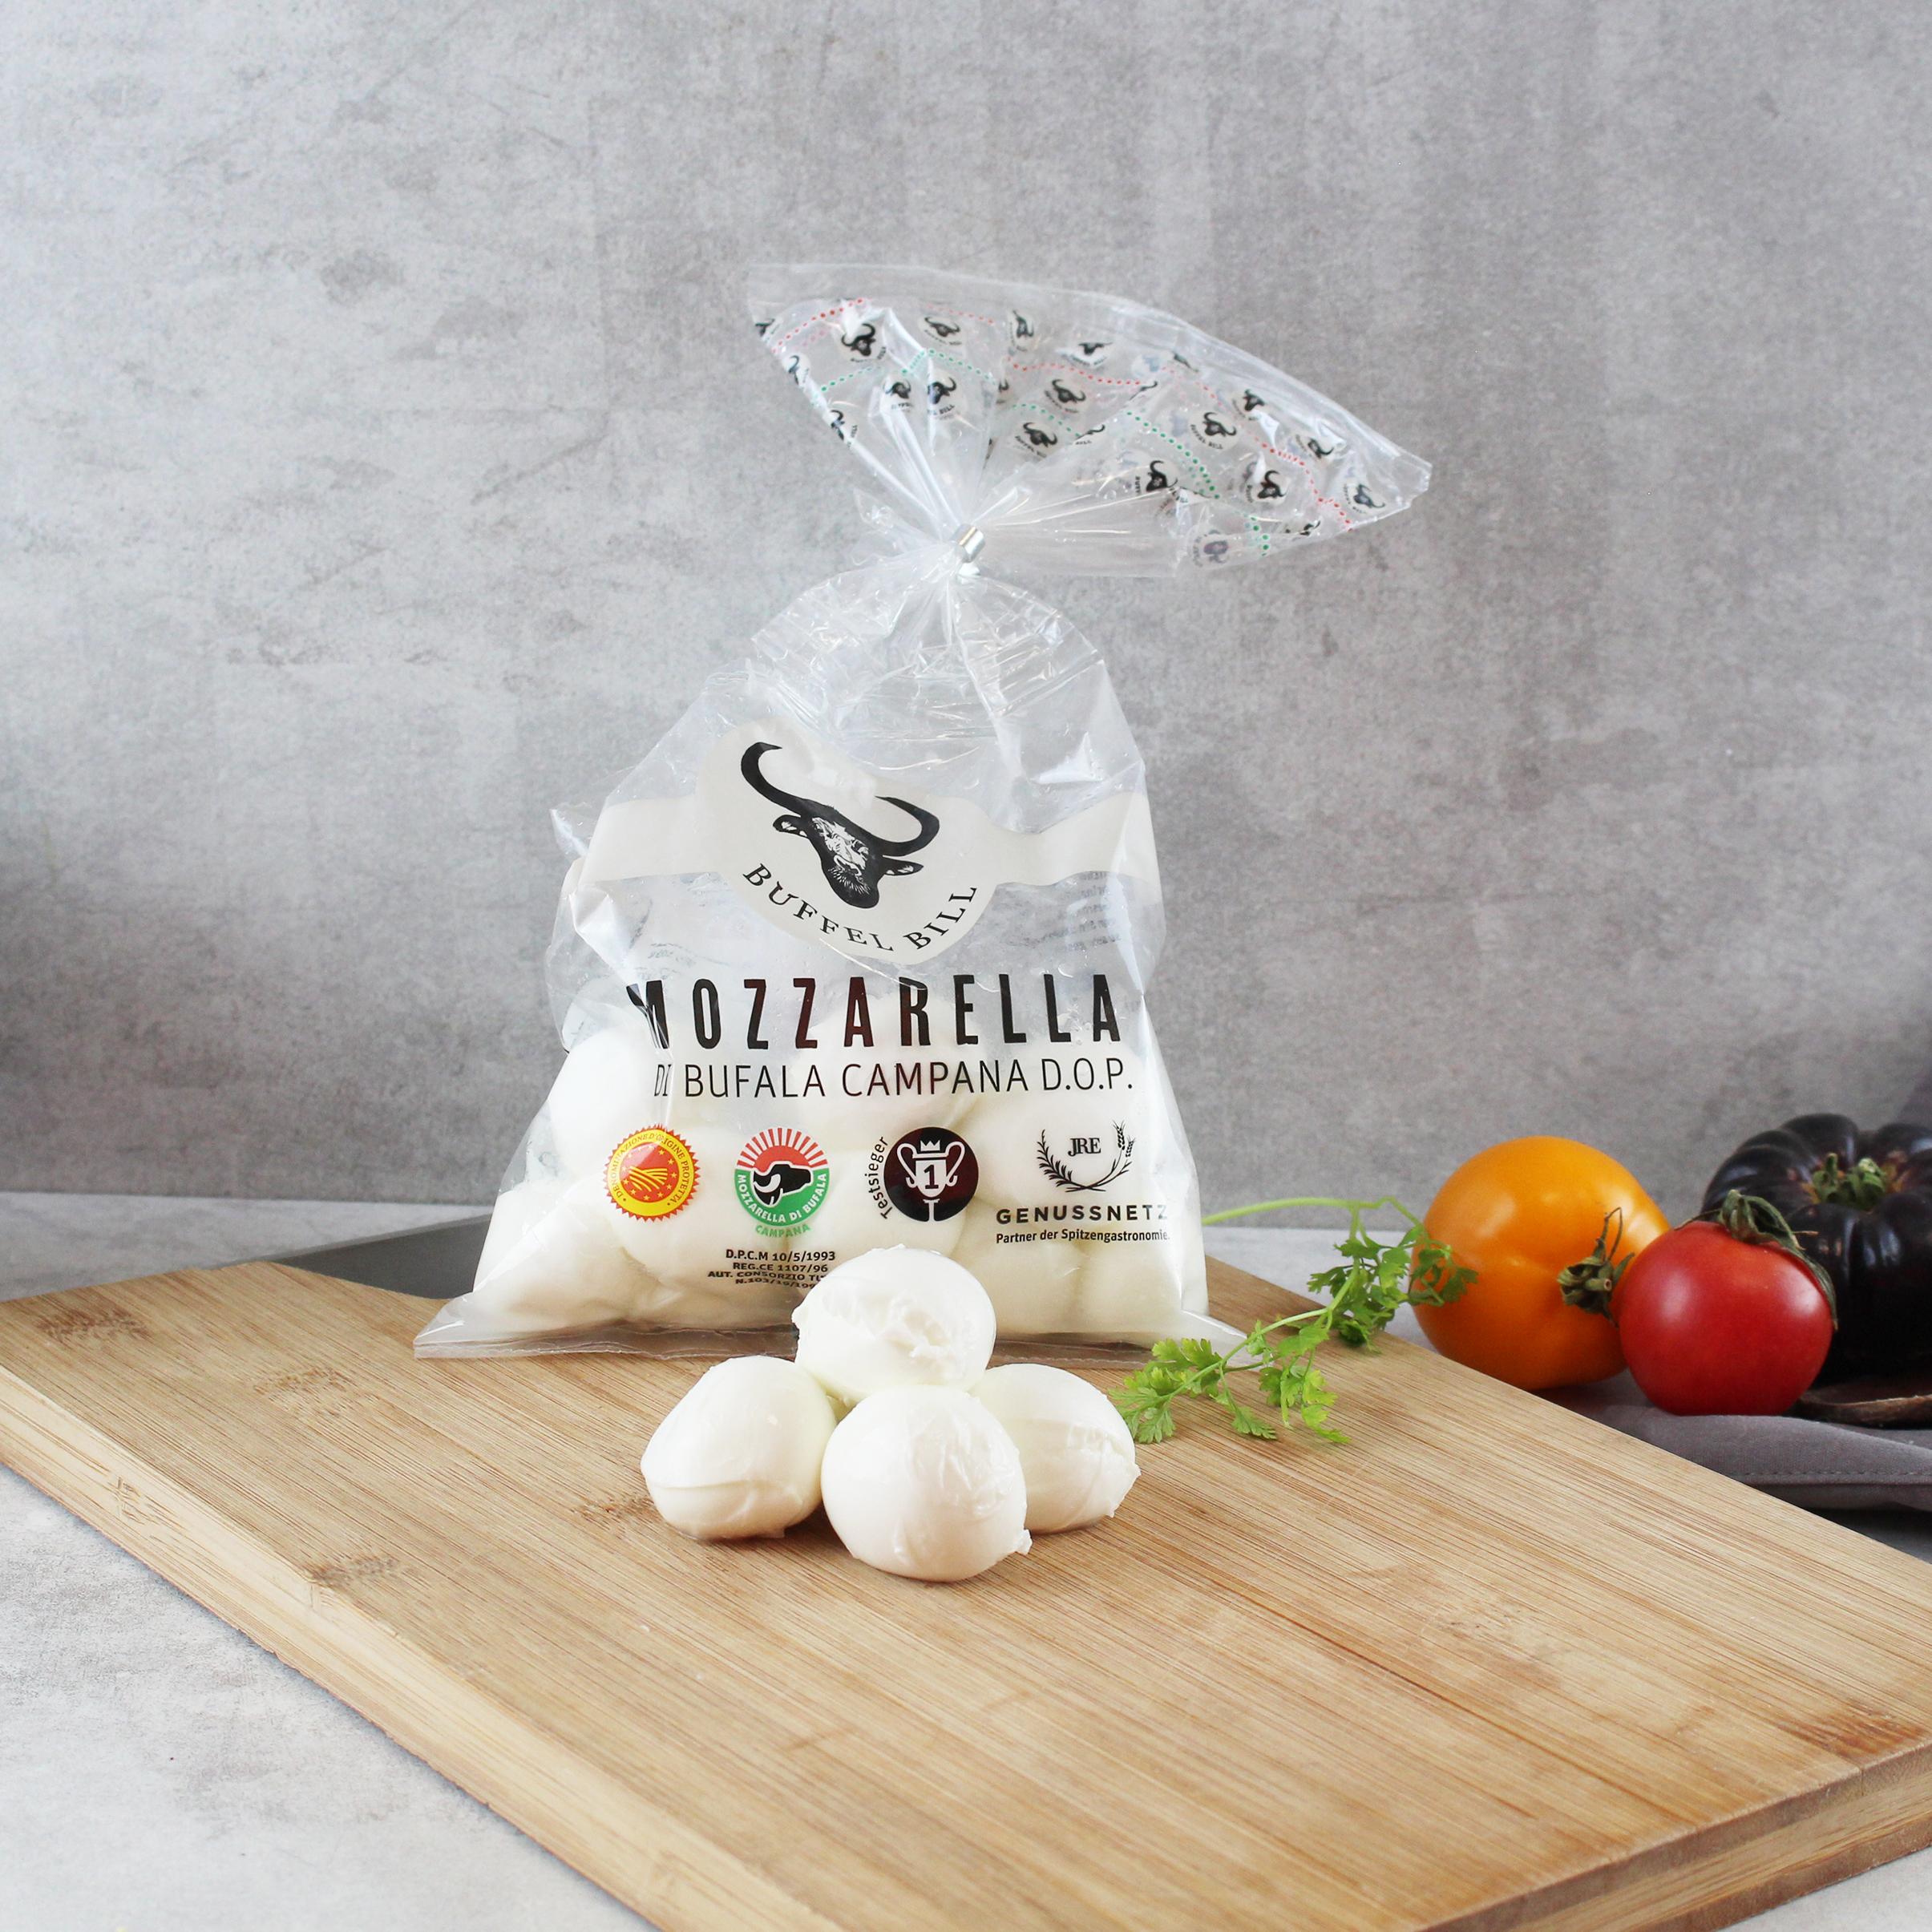 bb-mozzarella-di-bufala-d.o.p.-bueffel-bill-cardinali-italien-14x18g-packung-ca.-250-g-markthalle20-1